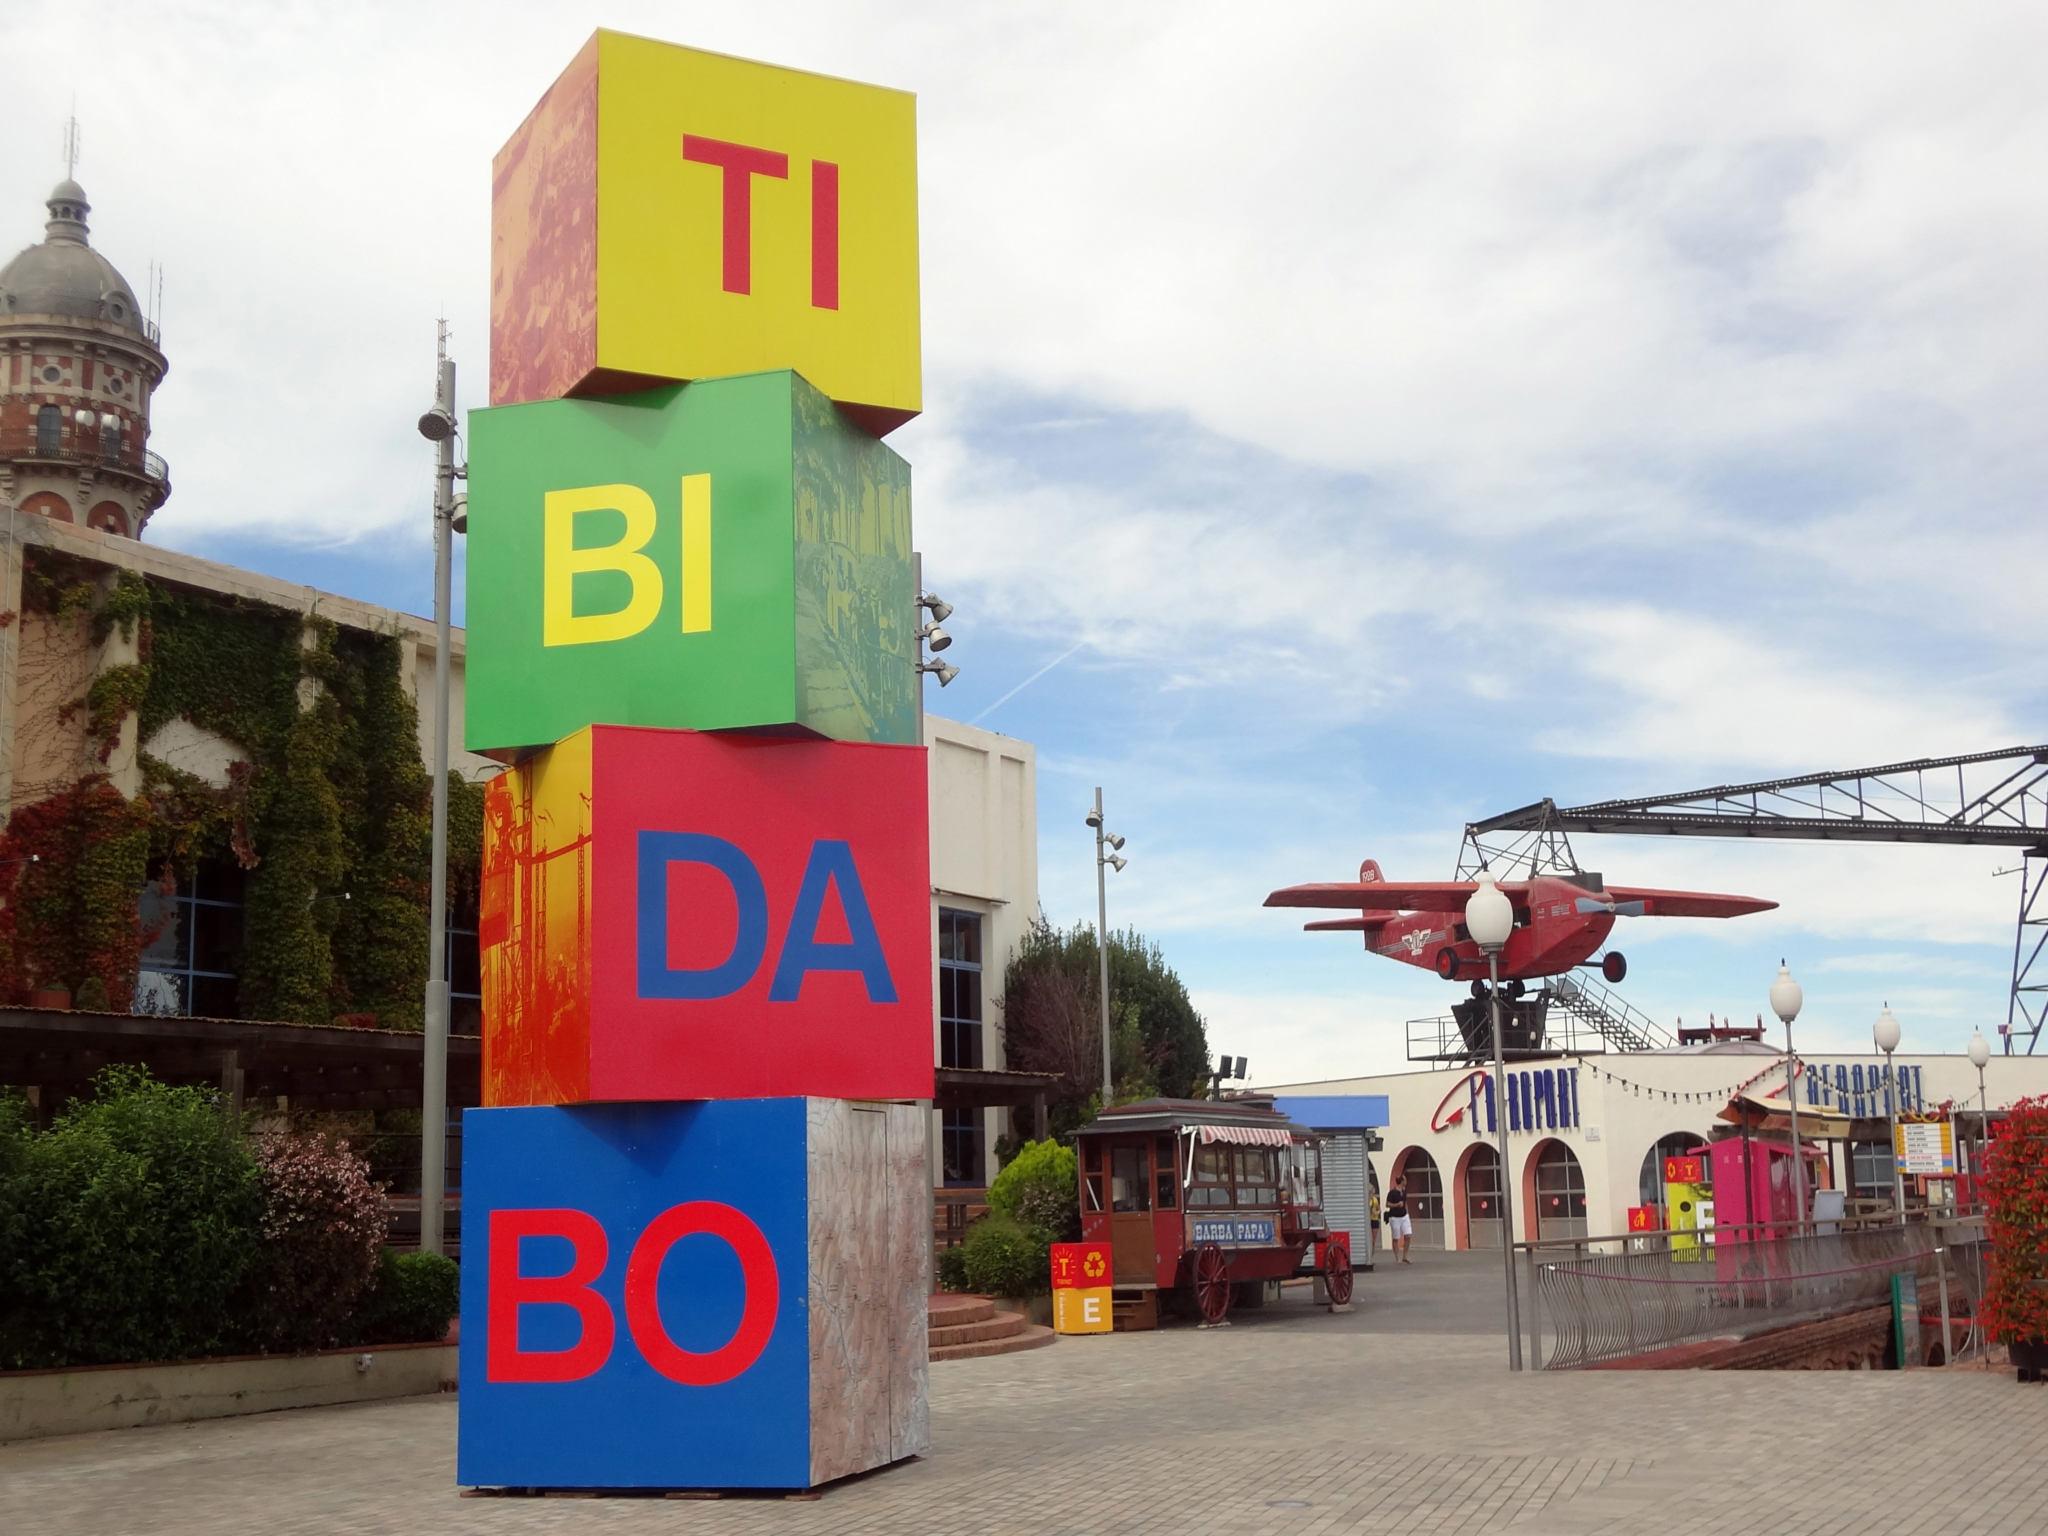 Barcelona - Tibidabo